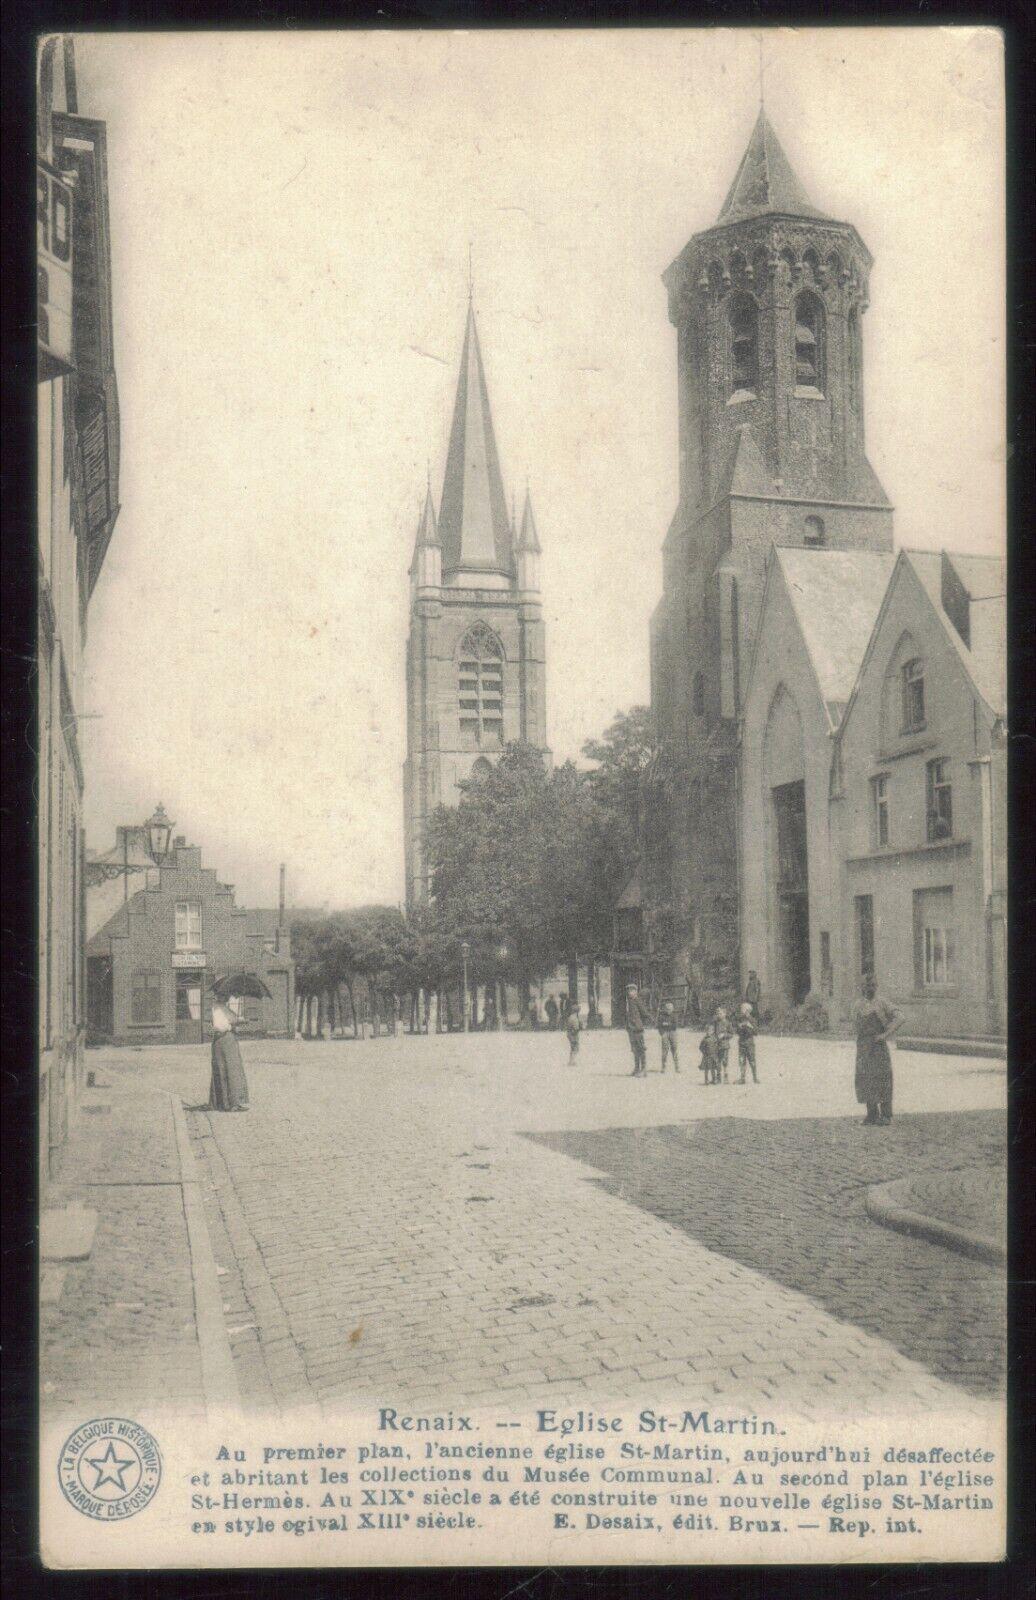 oude postkaart  van Ronse --Eglise St-Martin ,,zie foto's ,O 50 ,,